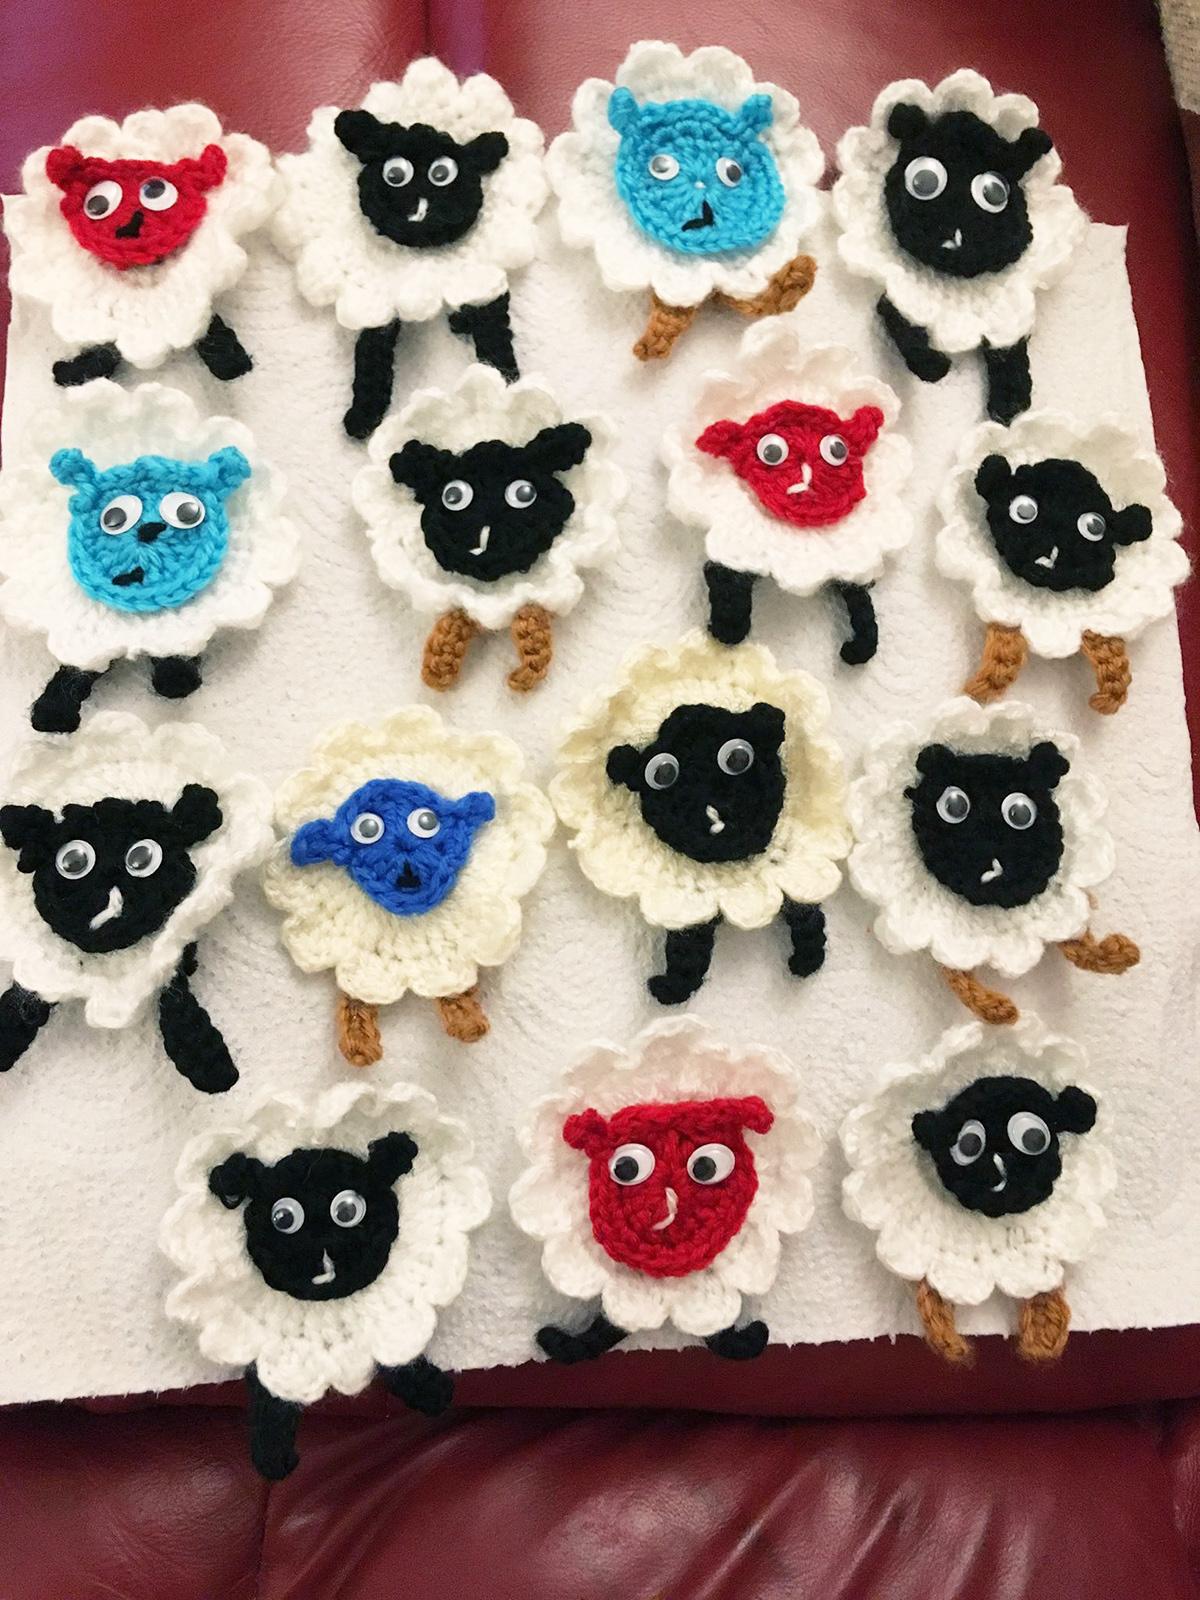 An array of crocheted sheep